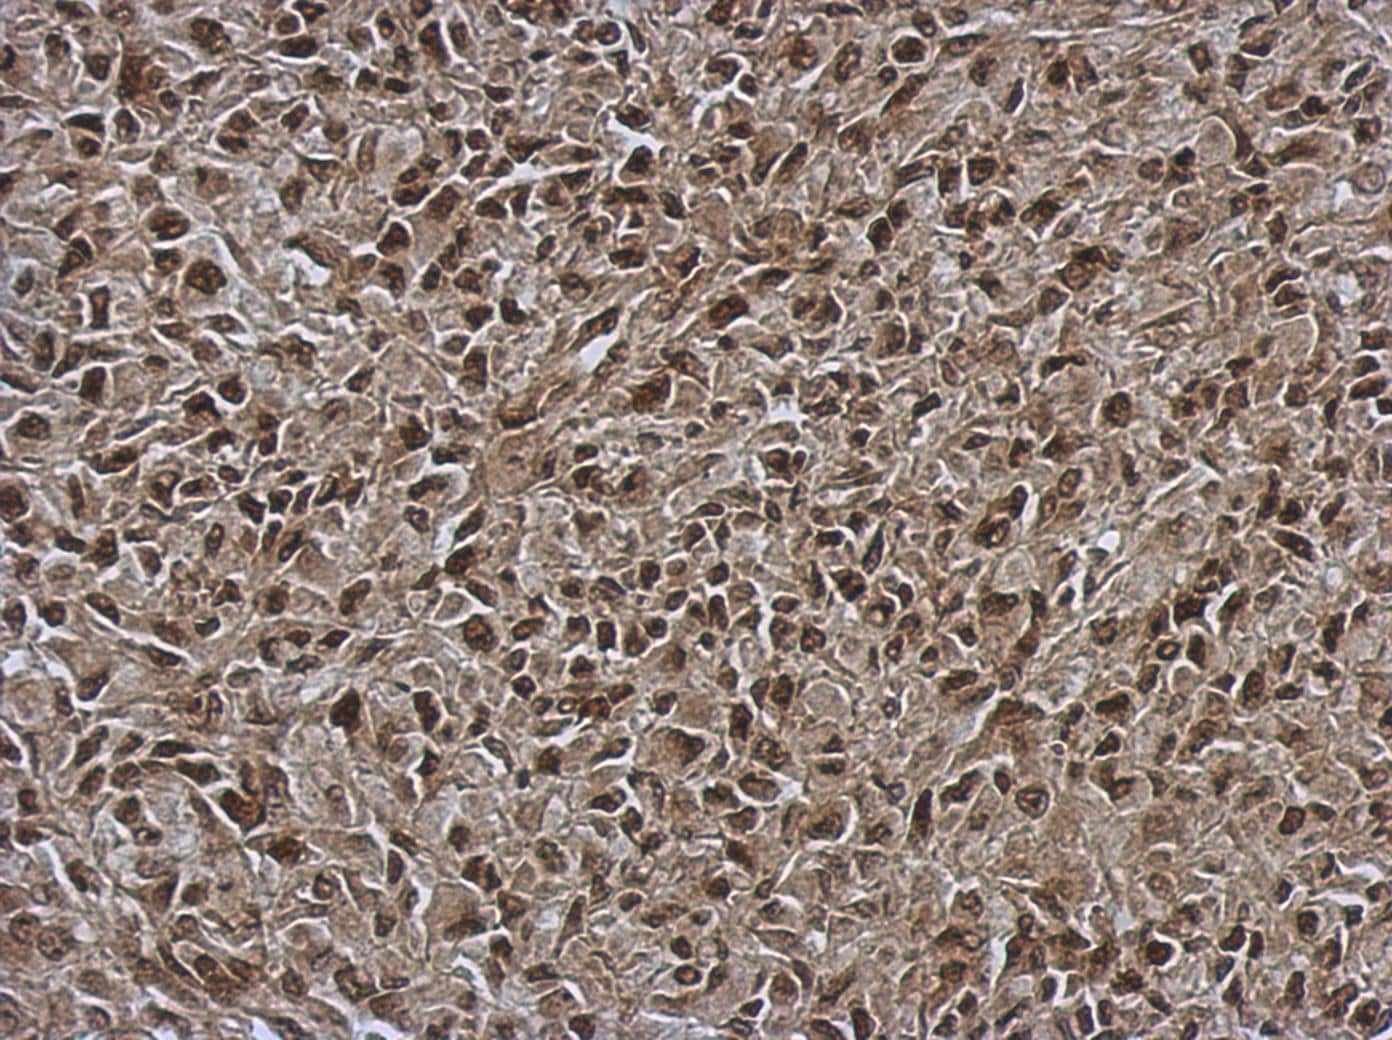 Immunohistochemistry (Formalin/PFA-fixed paraffin-embedded sections) - Anti-OSBPL9 antibody (ab127746)